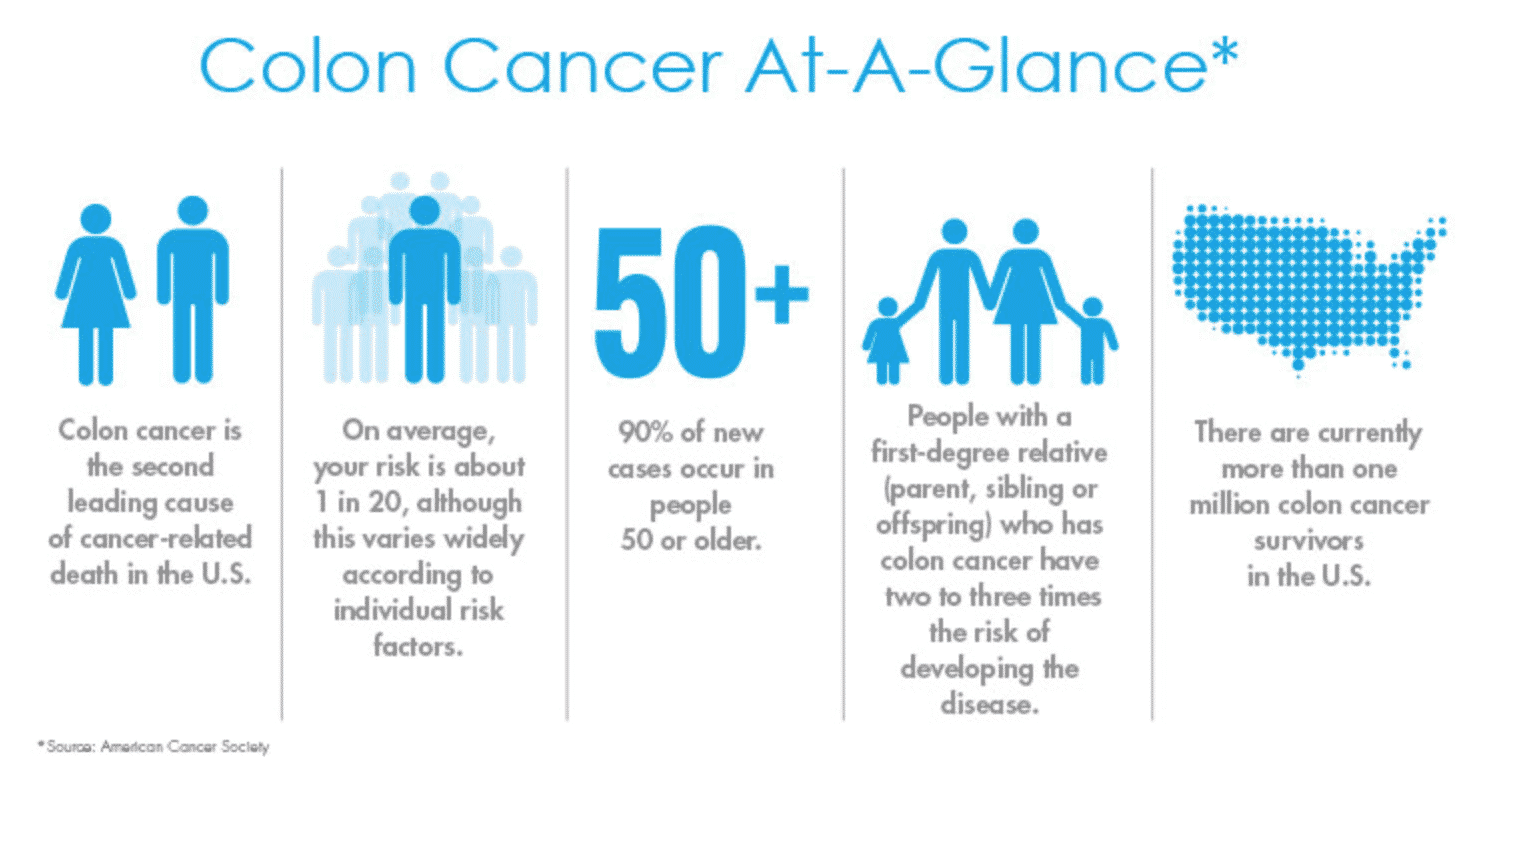 Colon Cancer at a glance